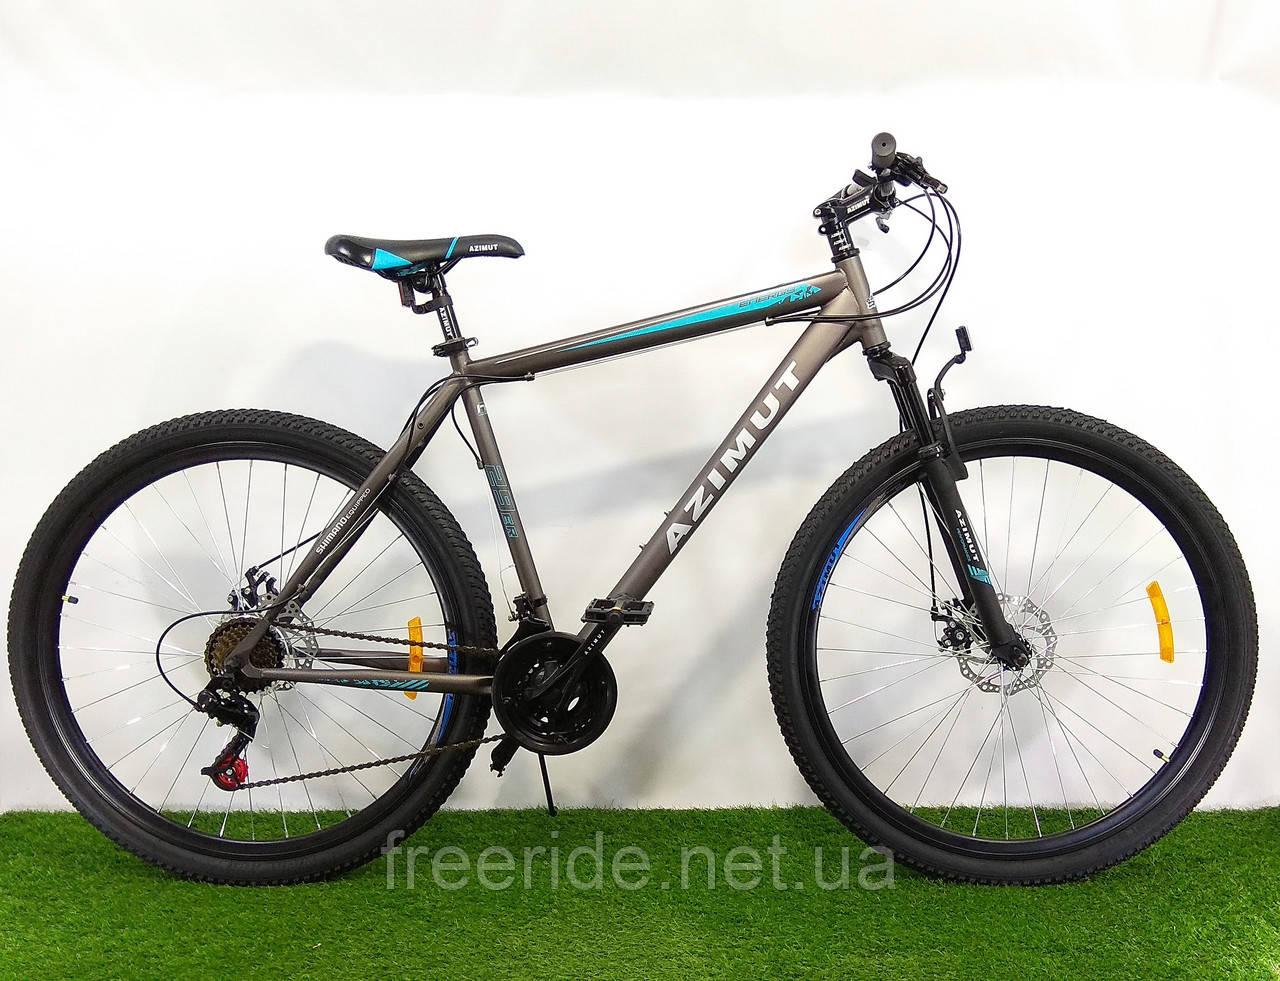 Горный Велосипед Azimut Energy 26 GD (21 рама)